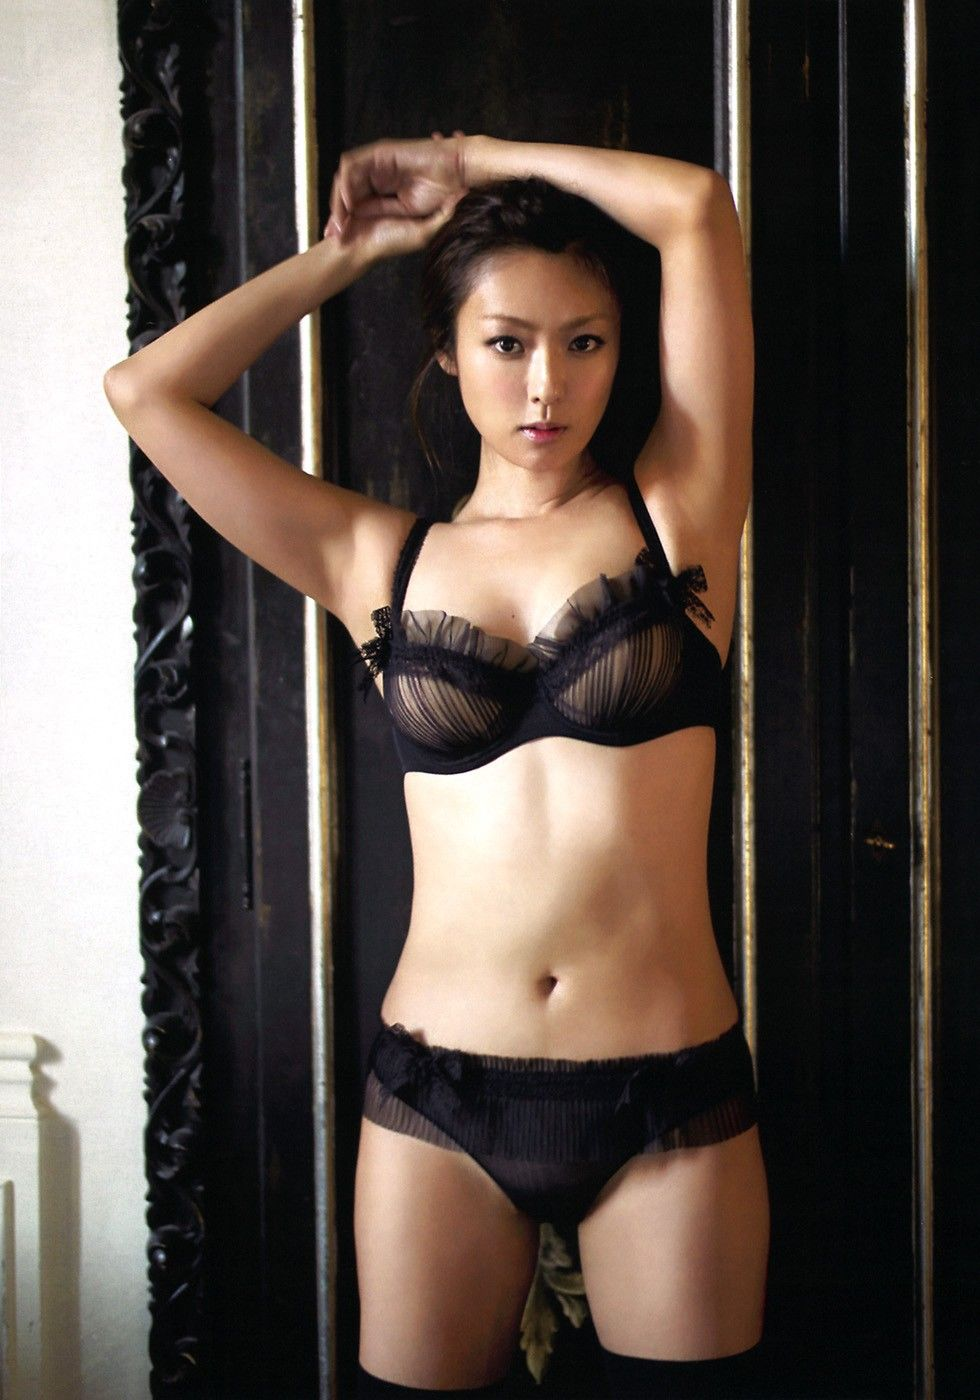 kyoko fukada nude fake Explore Japanese Models, Idol, and more!